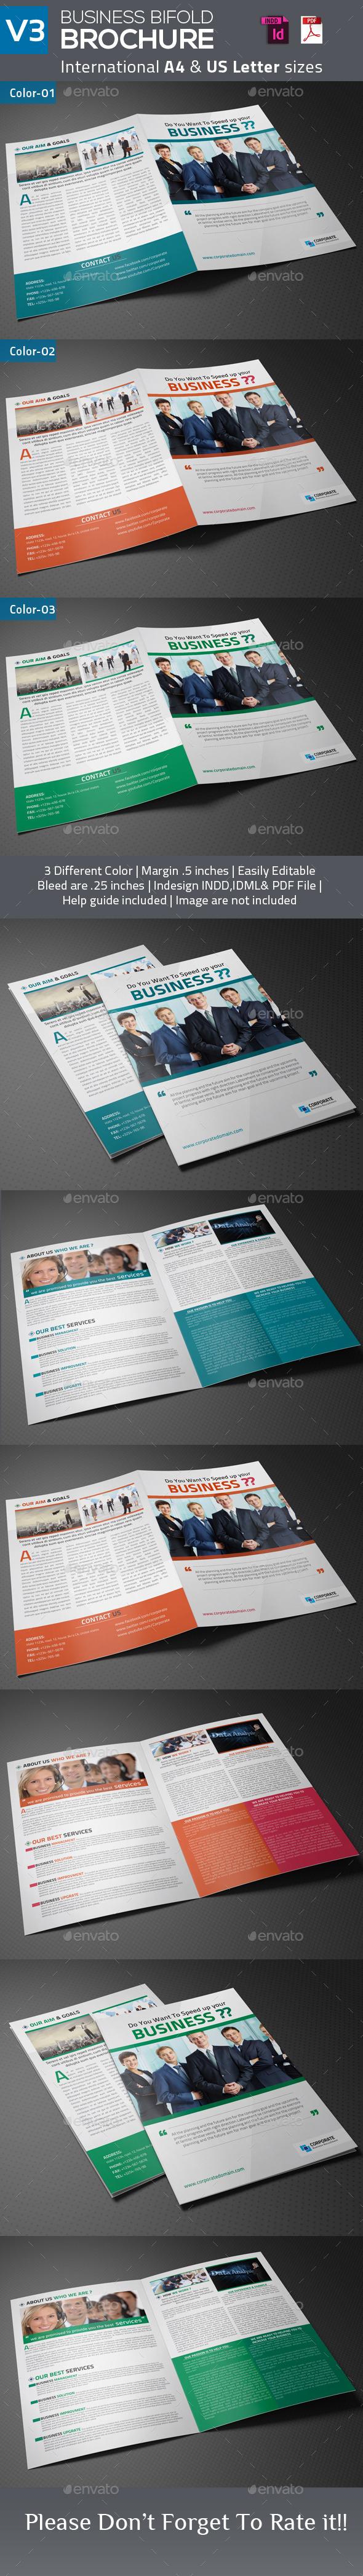 GraphicRiver Business Bifold Brochure V3 9177264